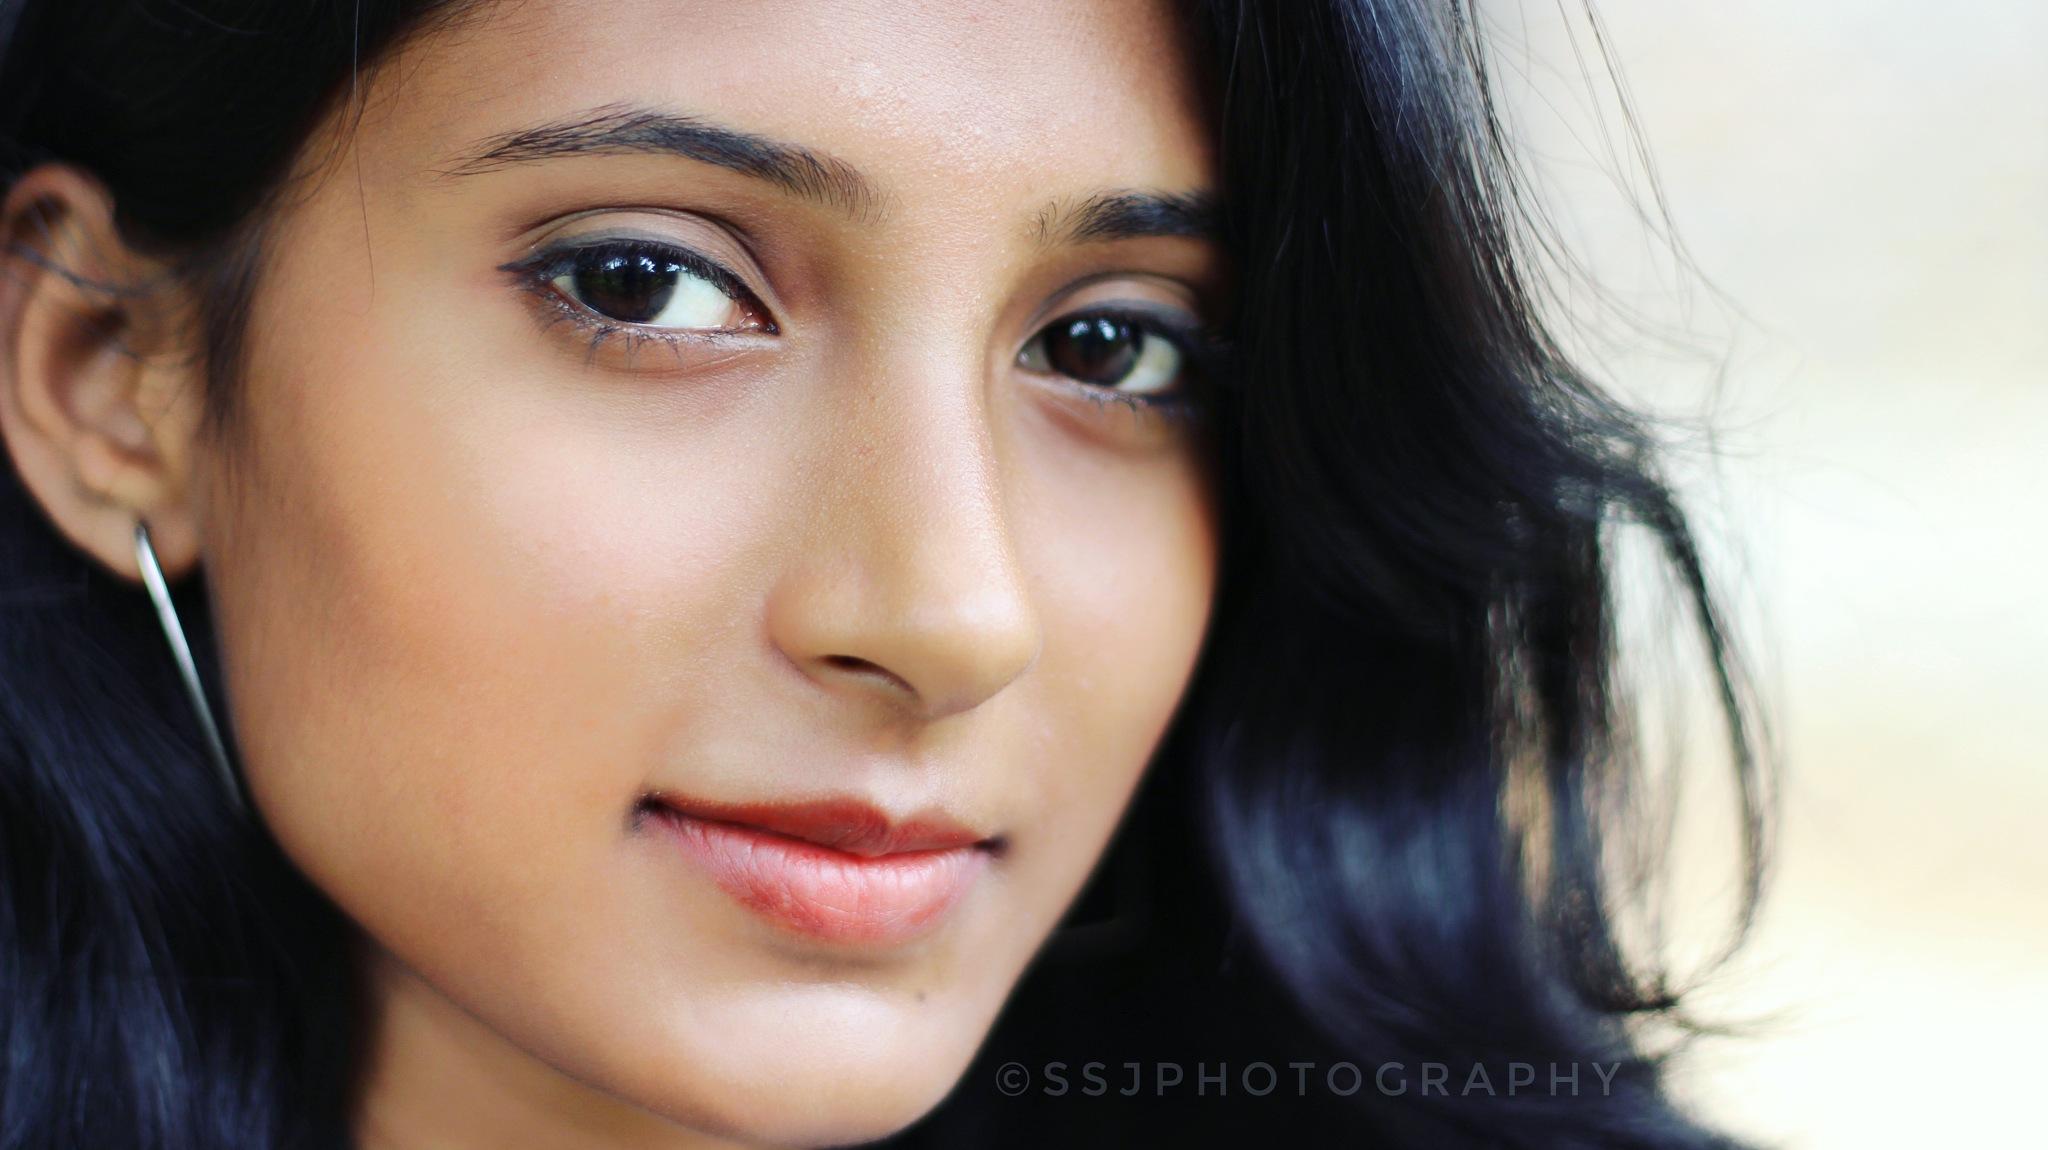 Portrait Photography by sandeshjadhav